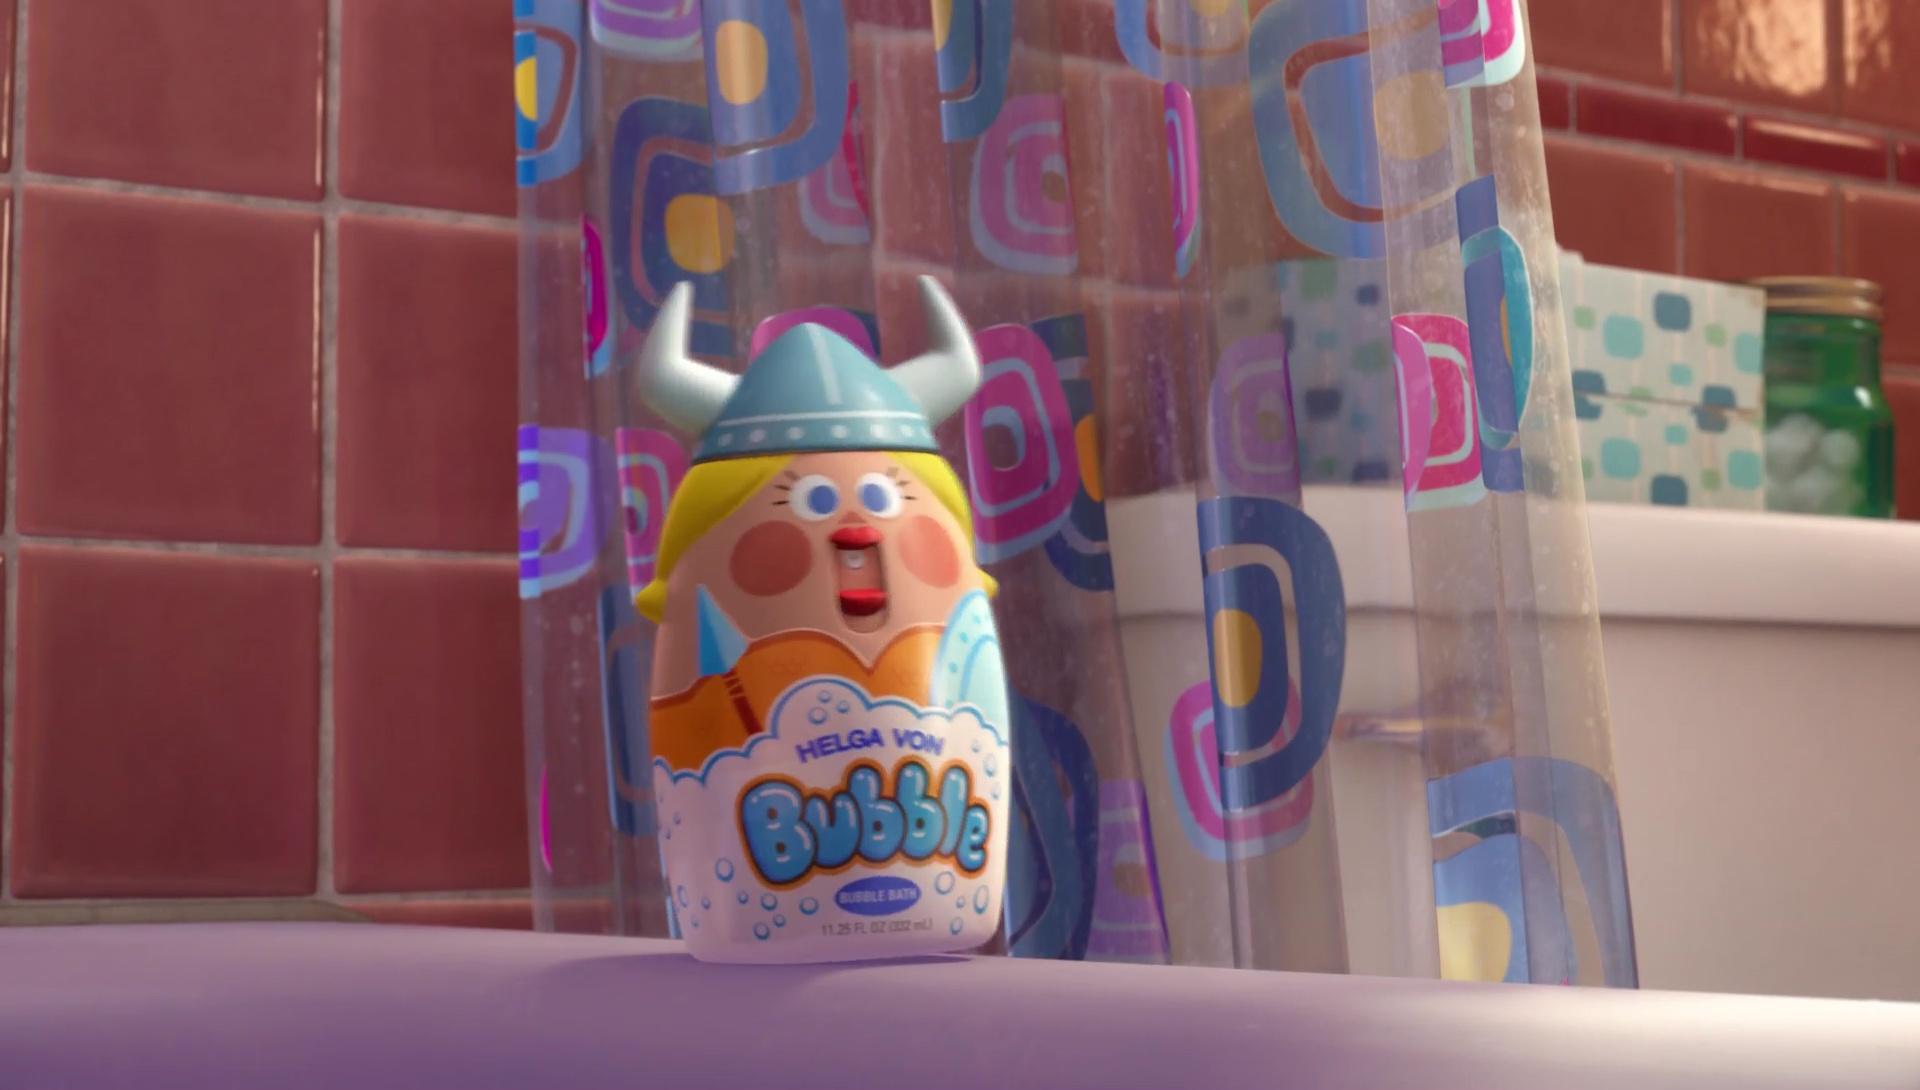 helga-von-bubble-personnage-toy-story-toons-rex-roi-fete-01